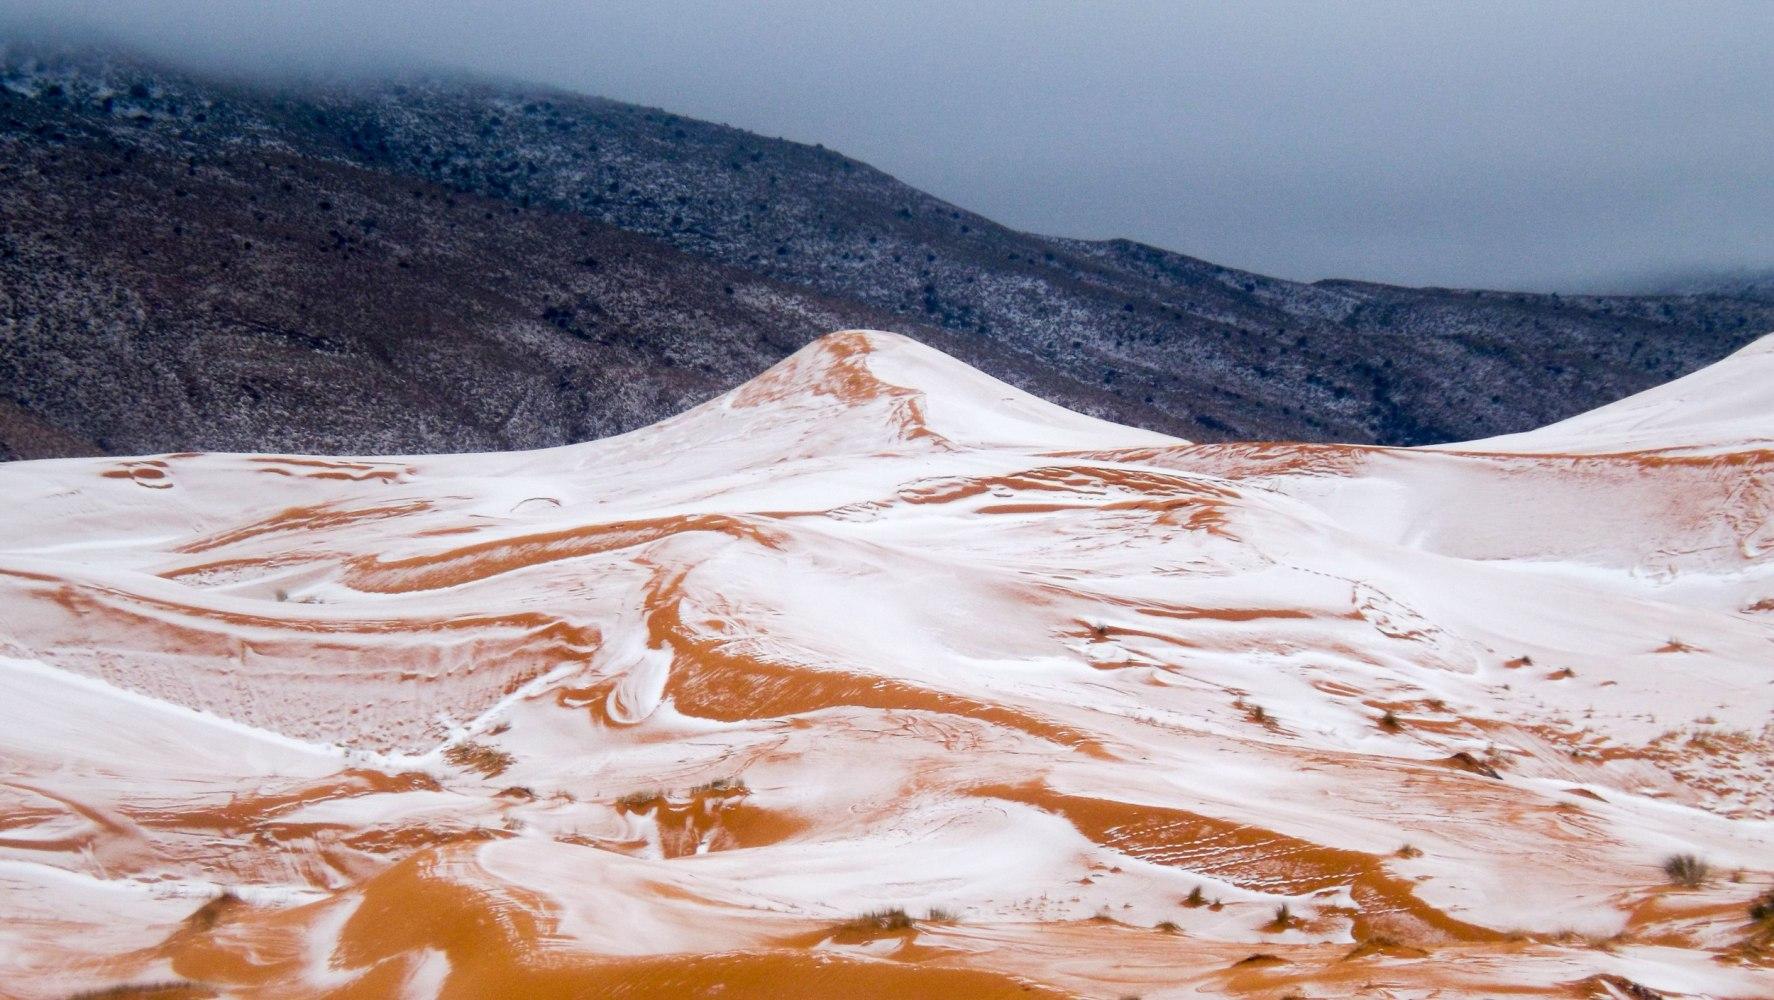 Snow In The Sahara Desert Ain Sefra Algeria 20 Dec 2016